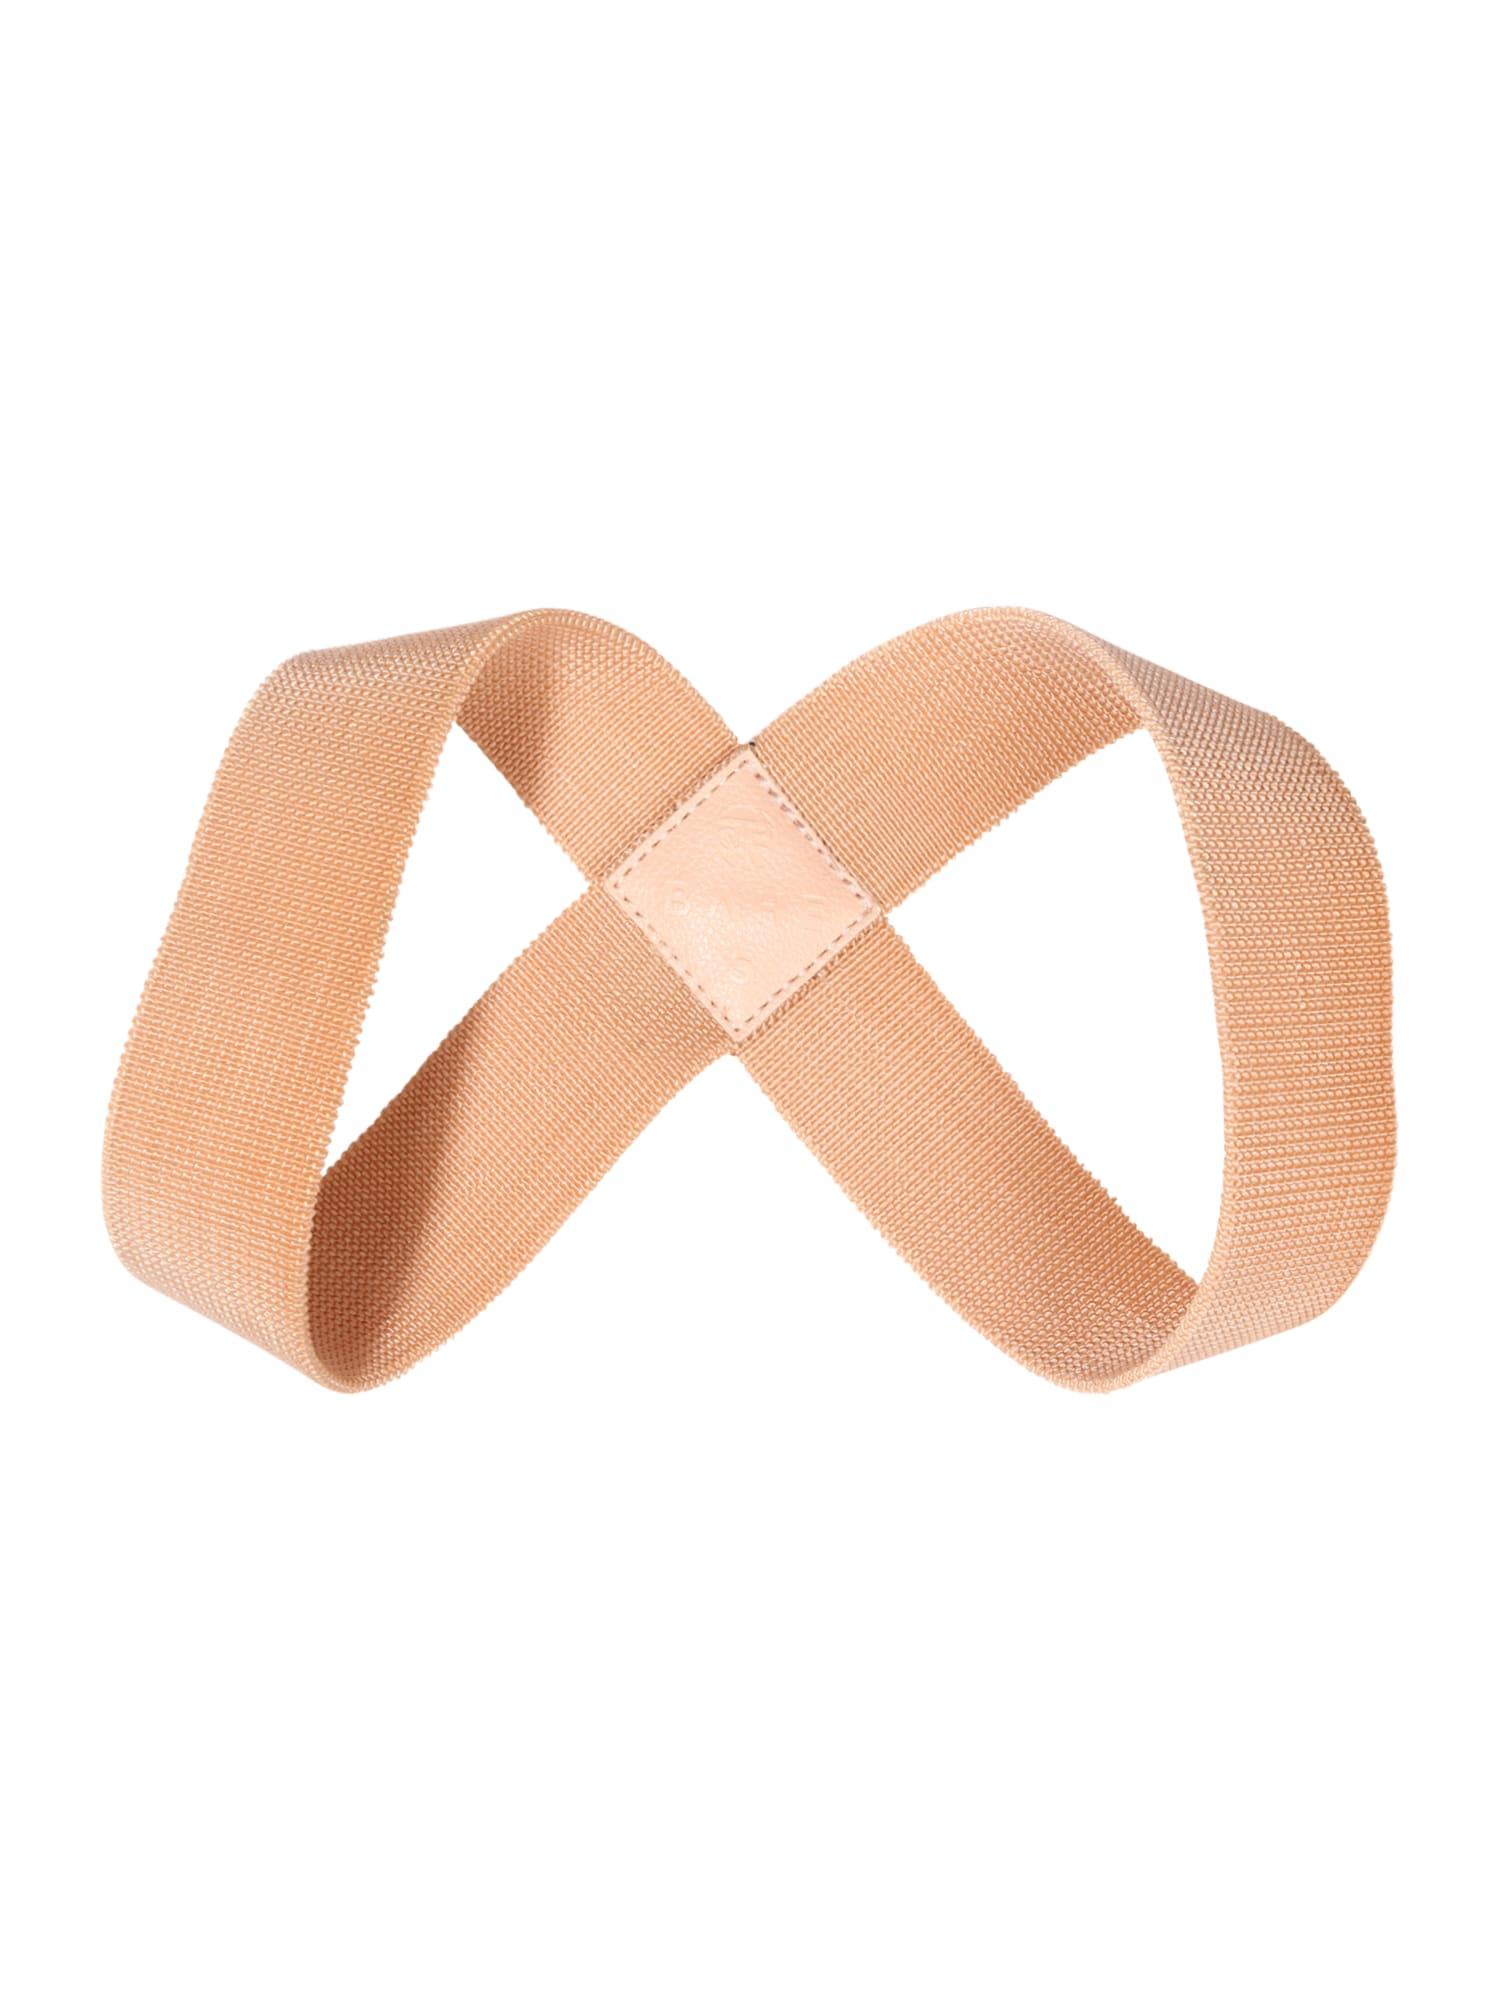 bahé yoga Tampri juosta abrikosų spalva